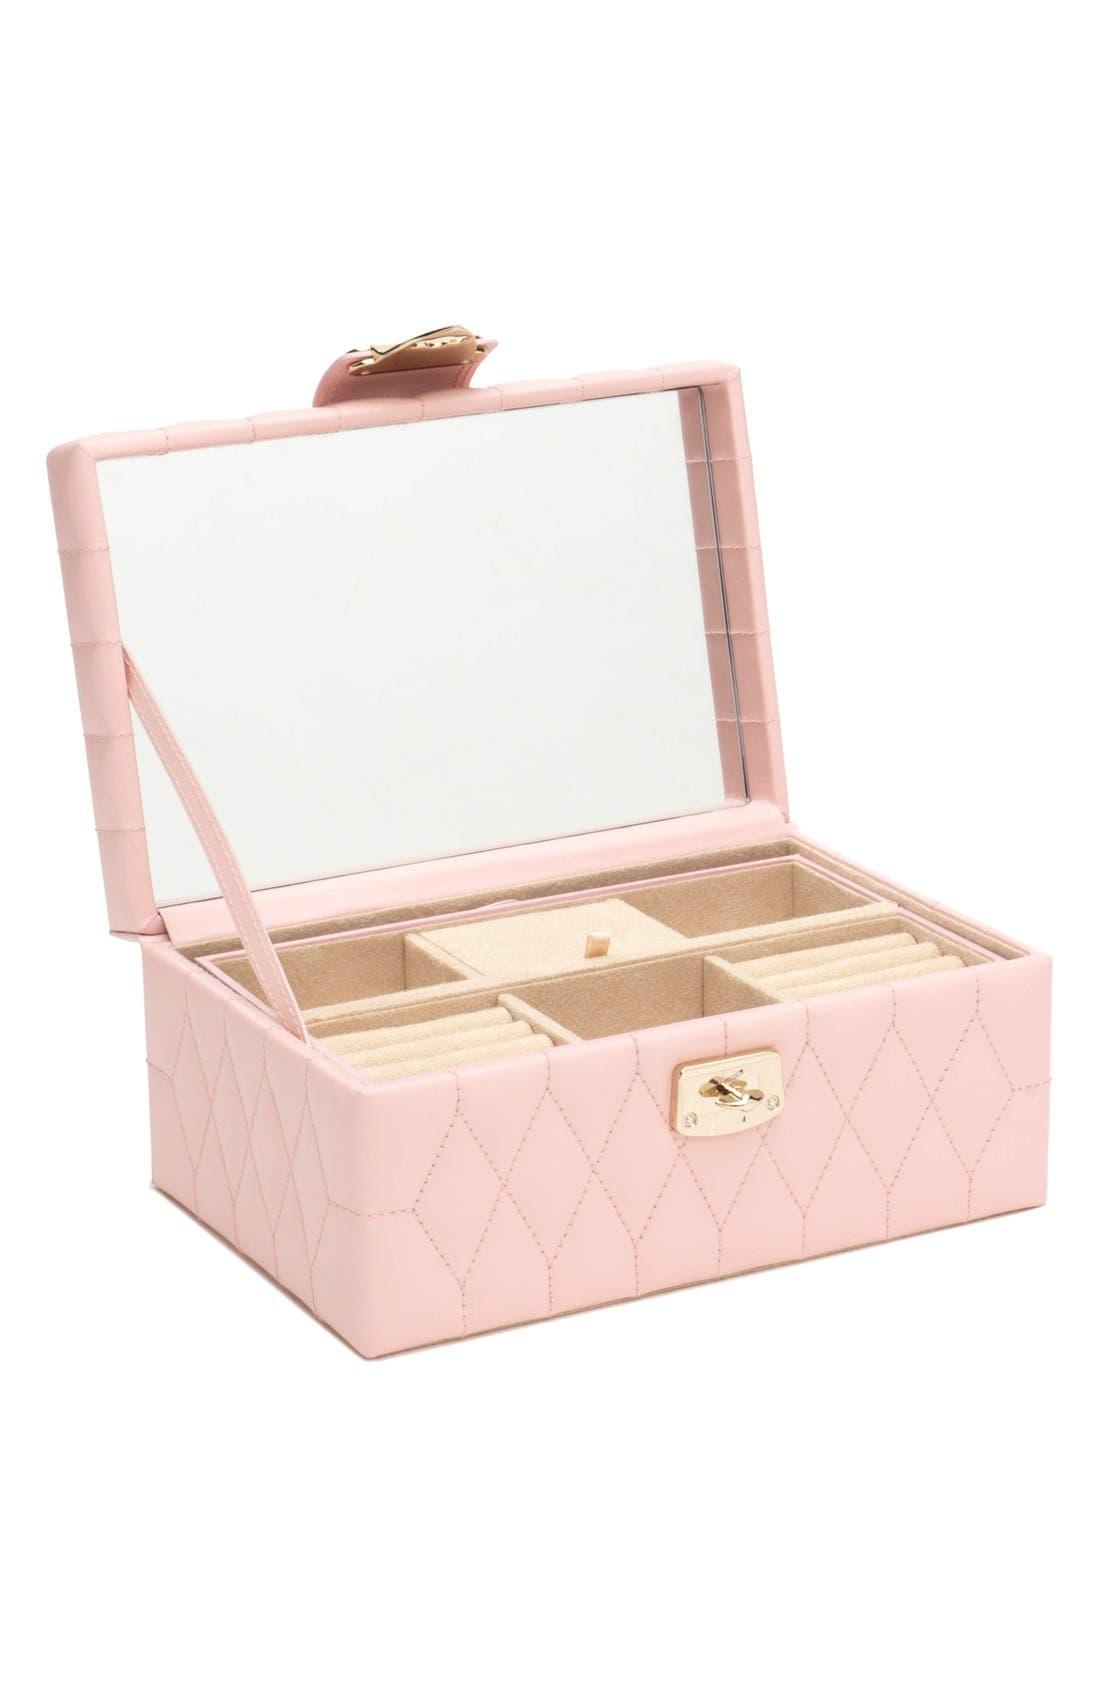 'Caroline' Jewelry Case,                             Alternate thumbnail 4, color,                             Rose Quartz